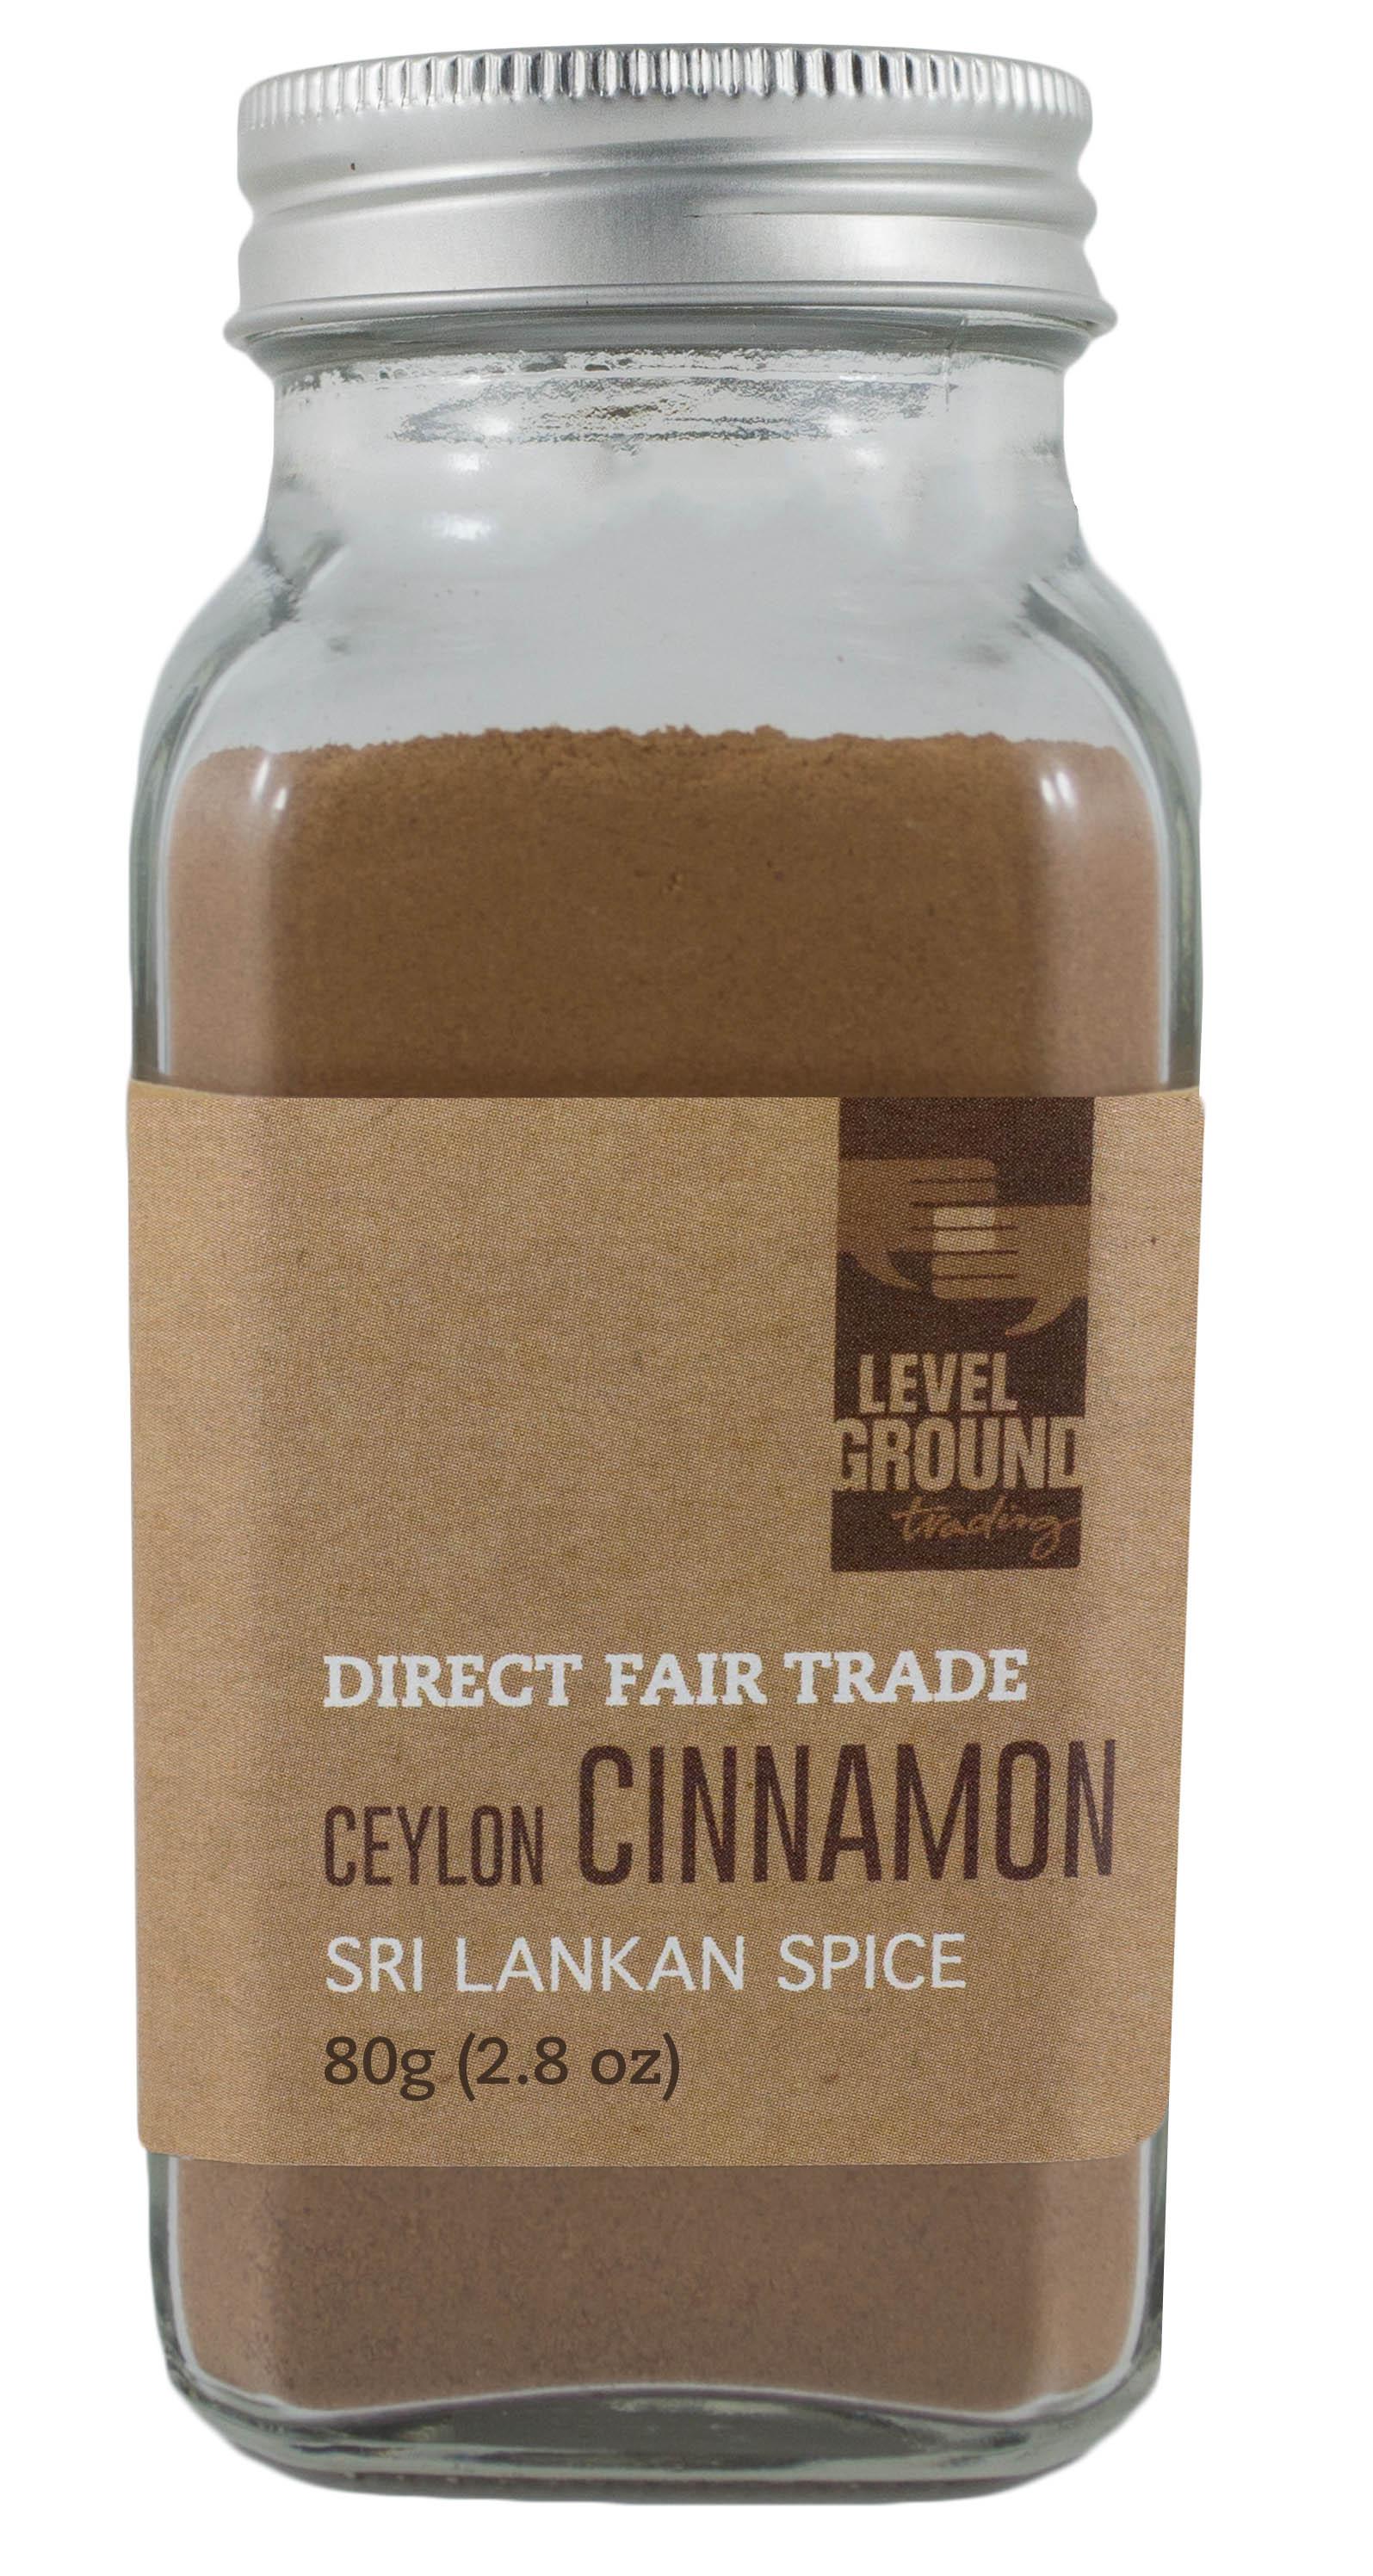 ceylon cinnamon package